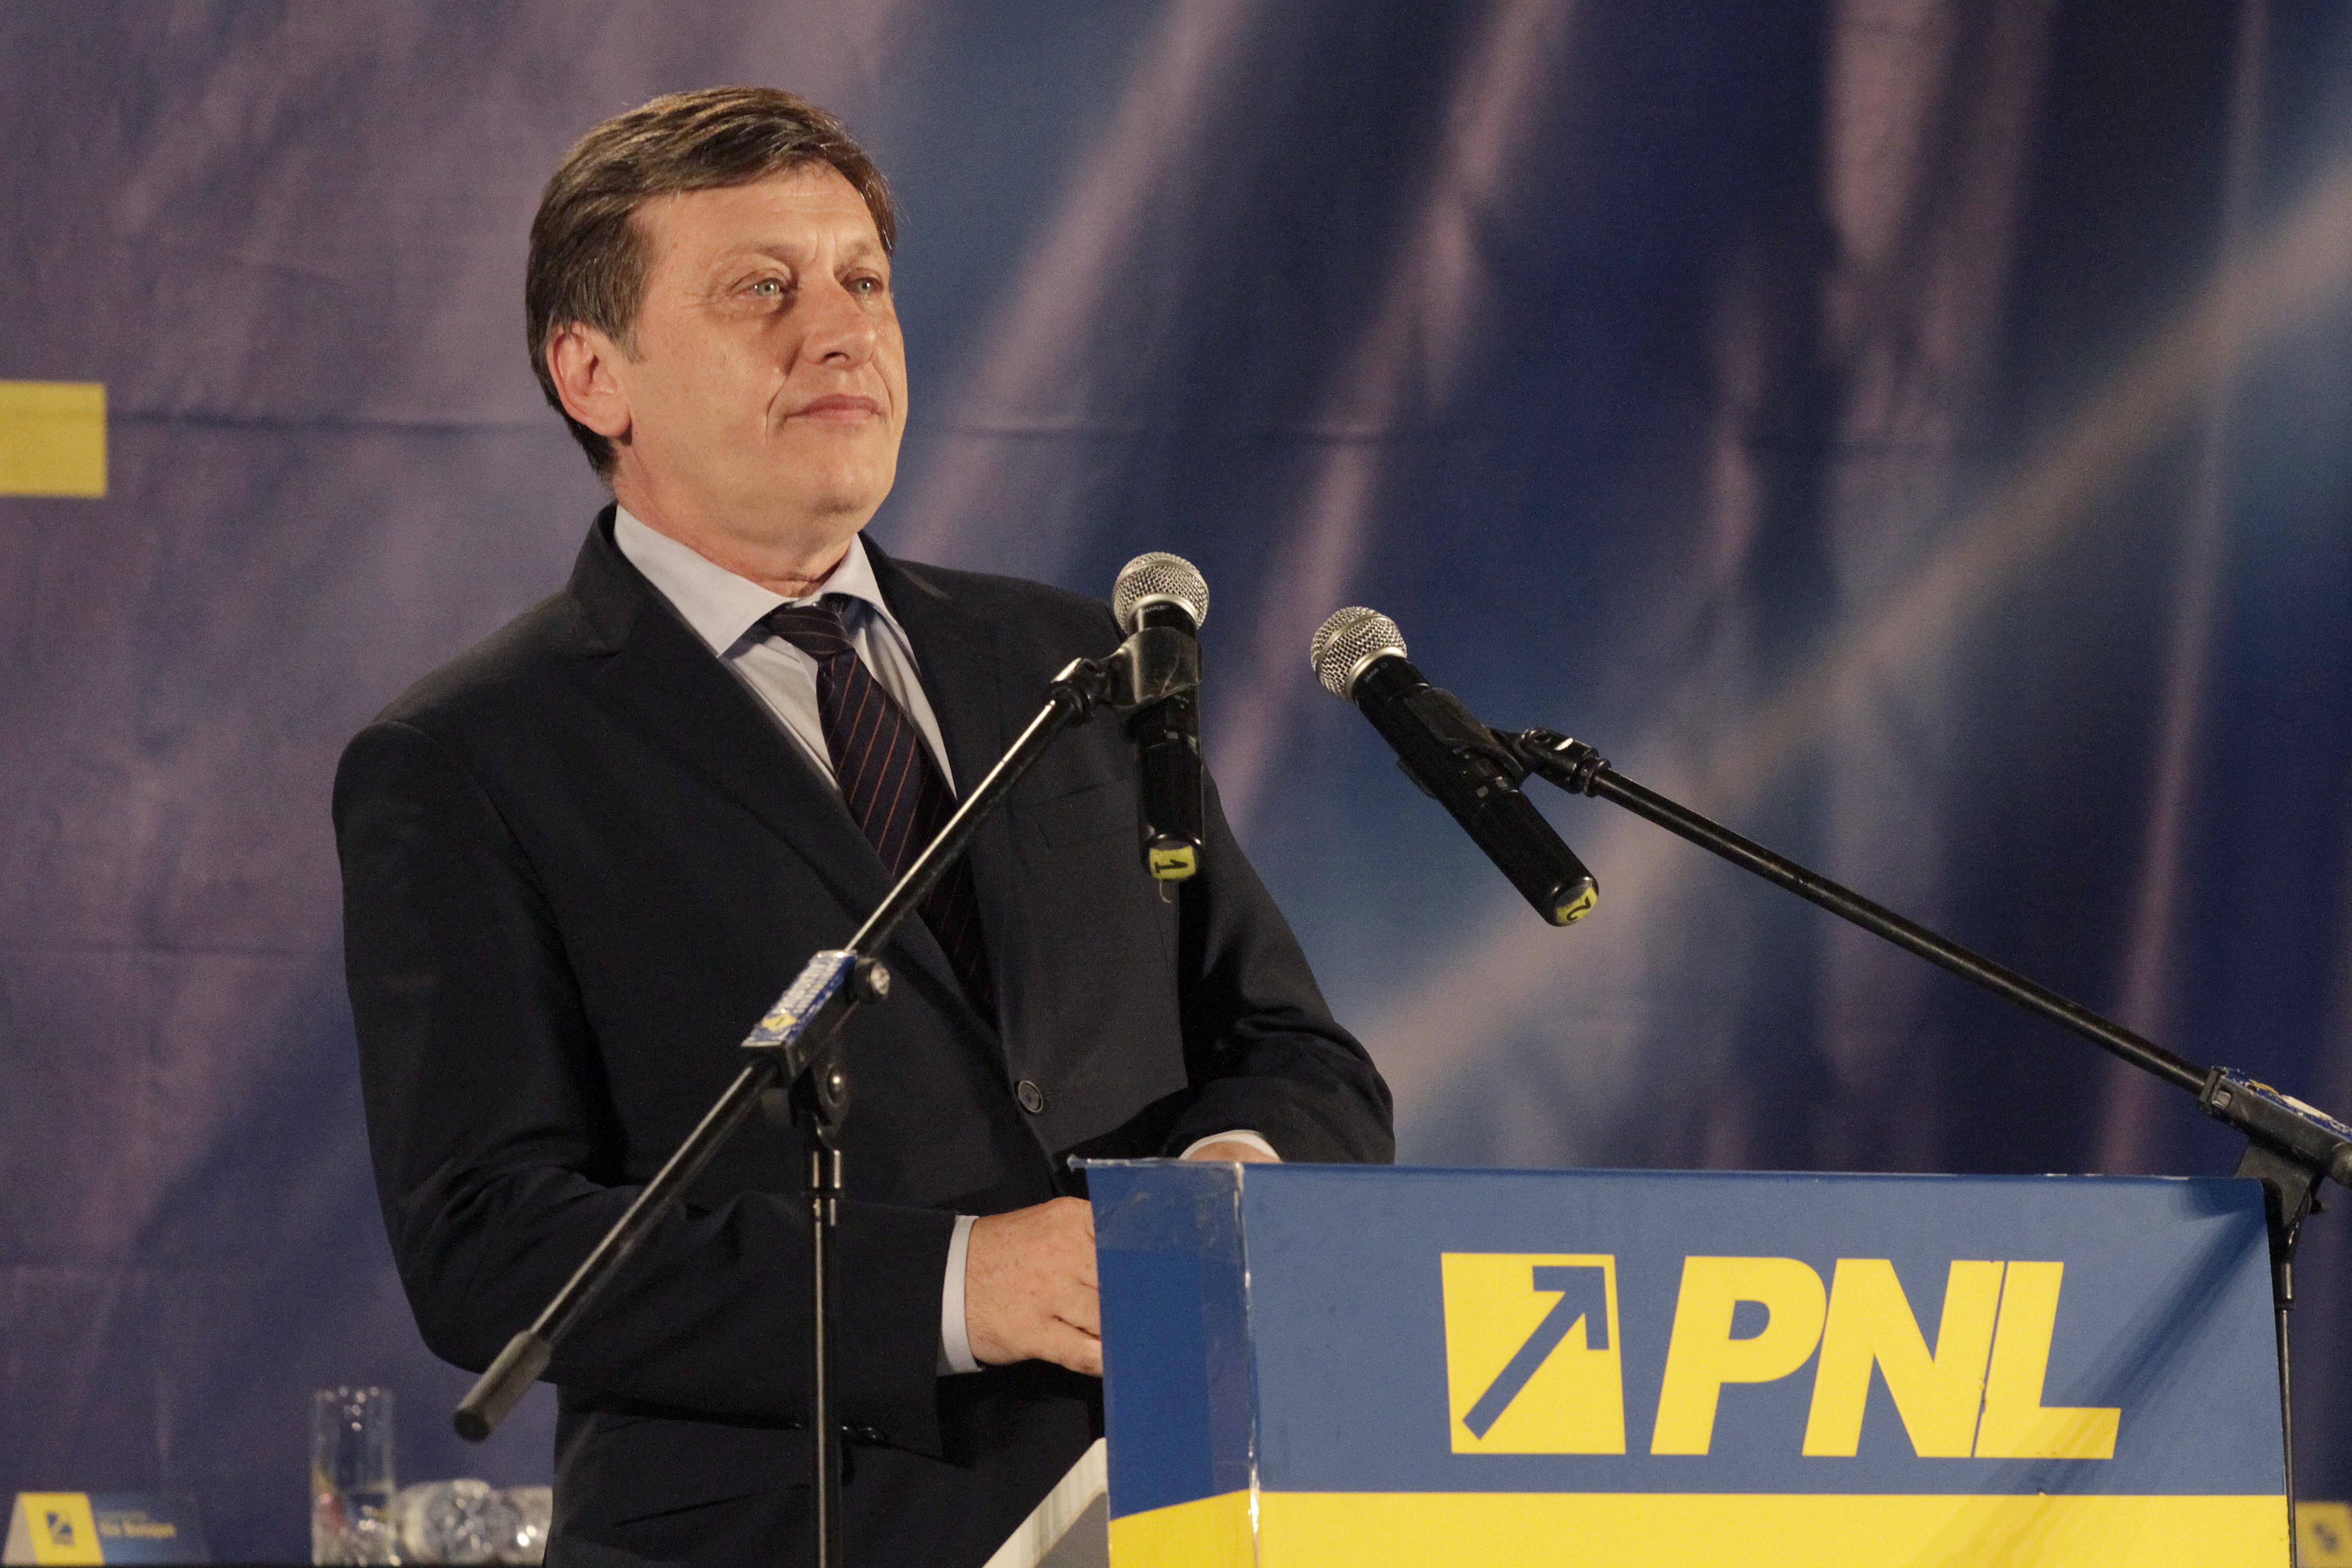 Ce a raspuns Crin Antonescu cand a fost intrebat daca i-a returnat votul lui Victor Ponta din 2009